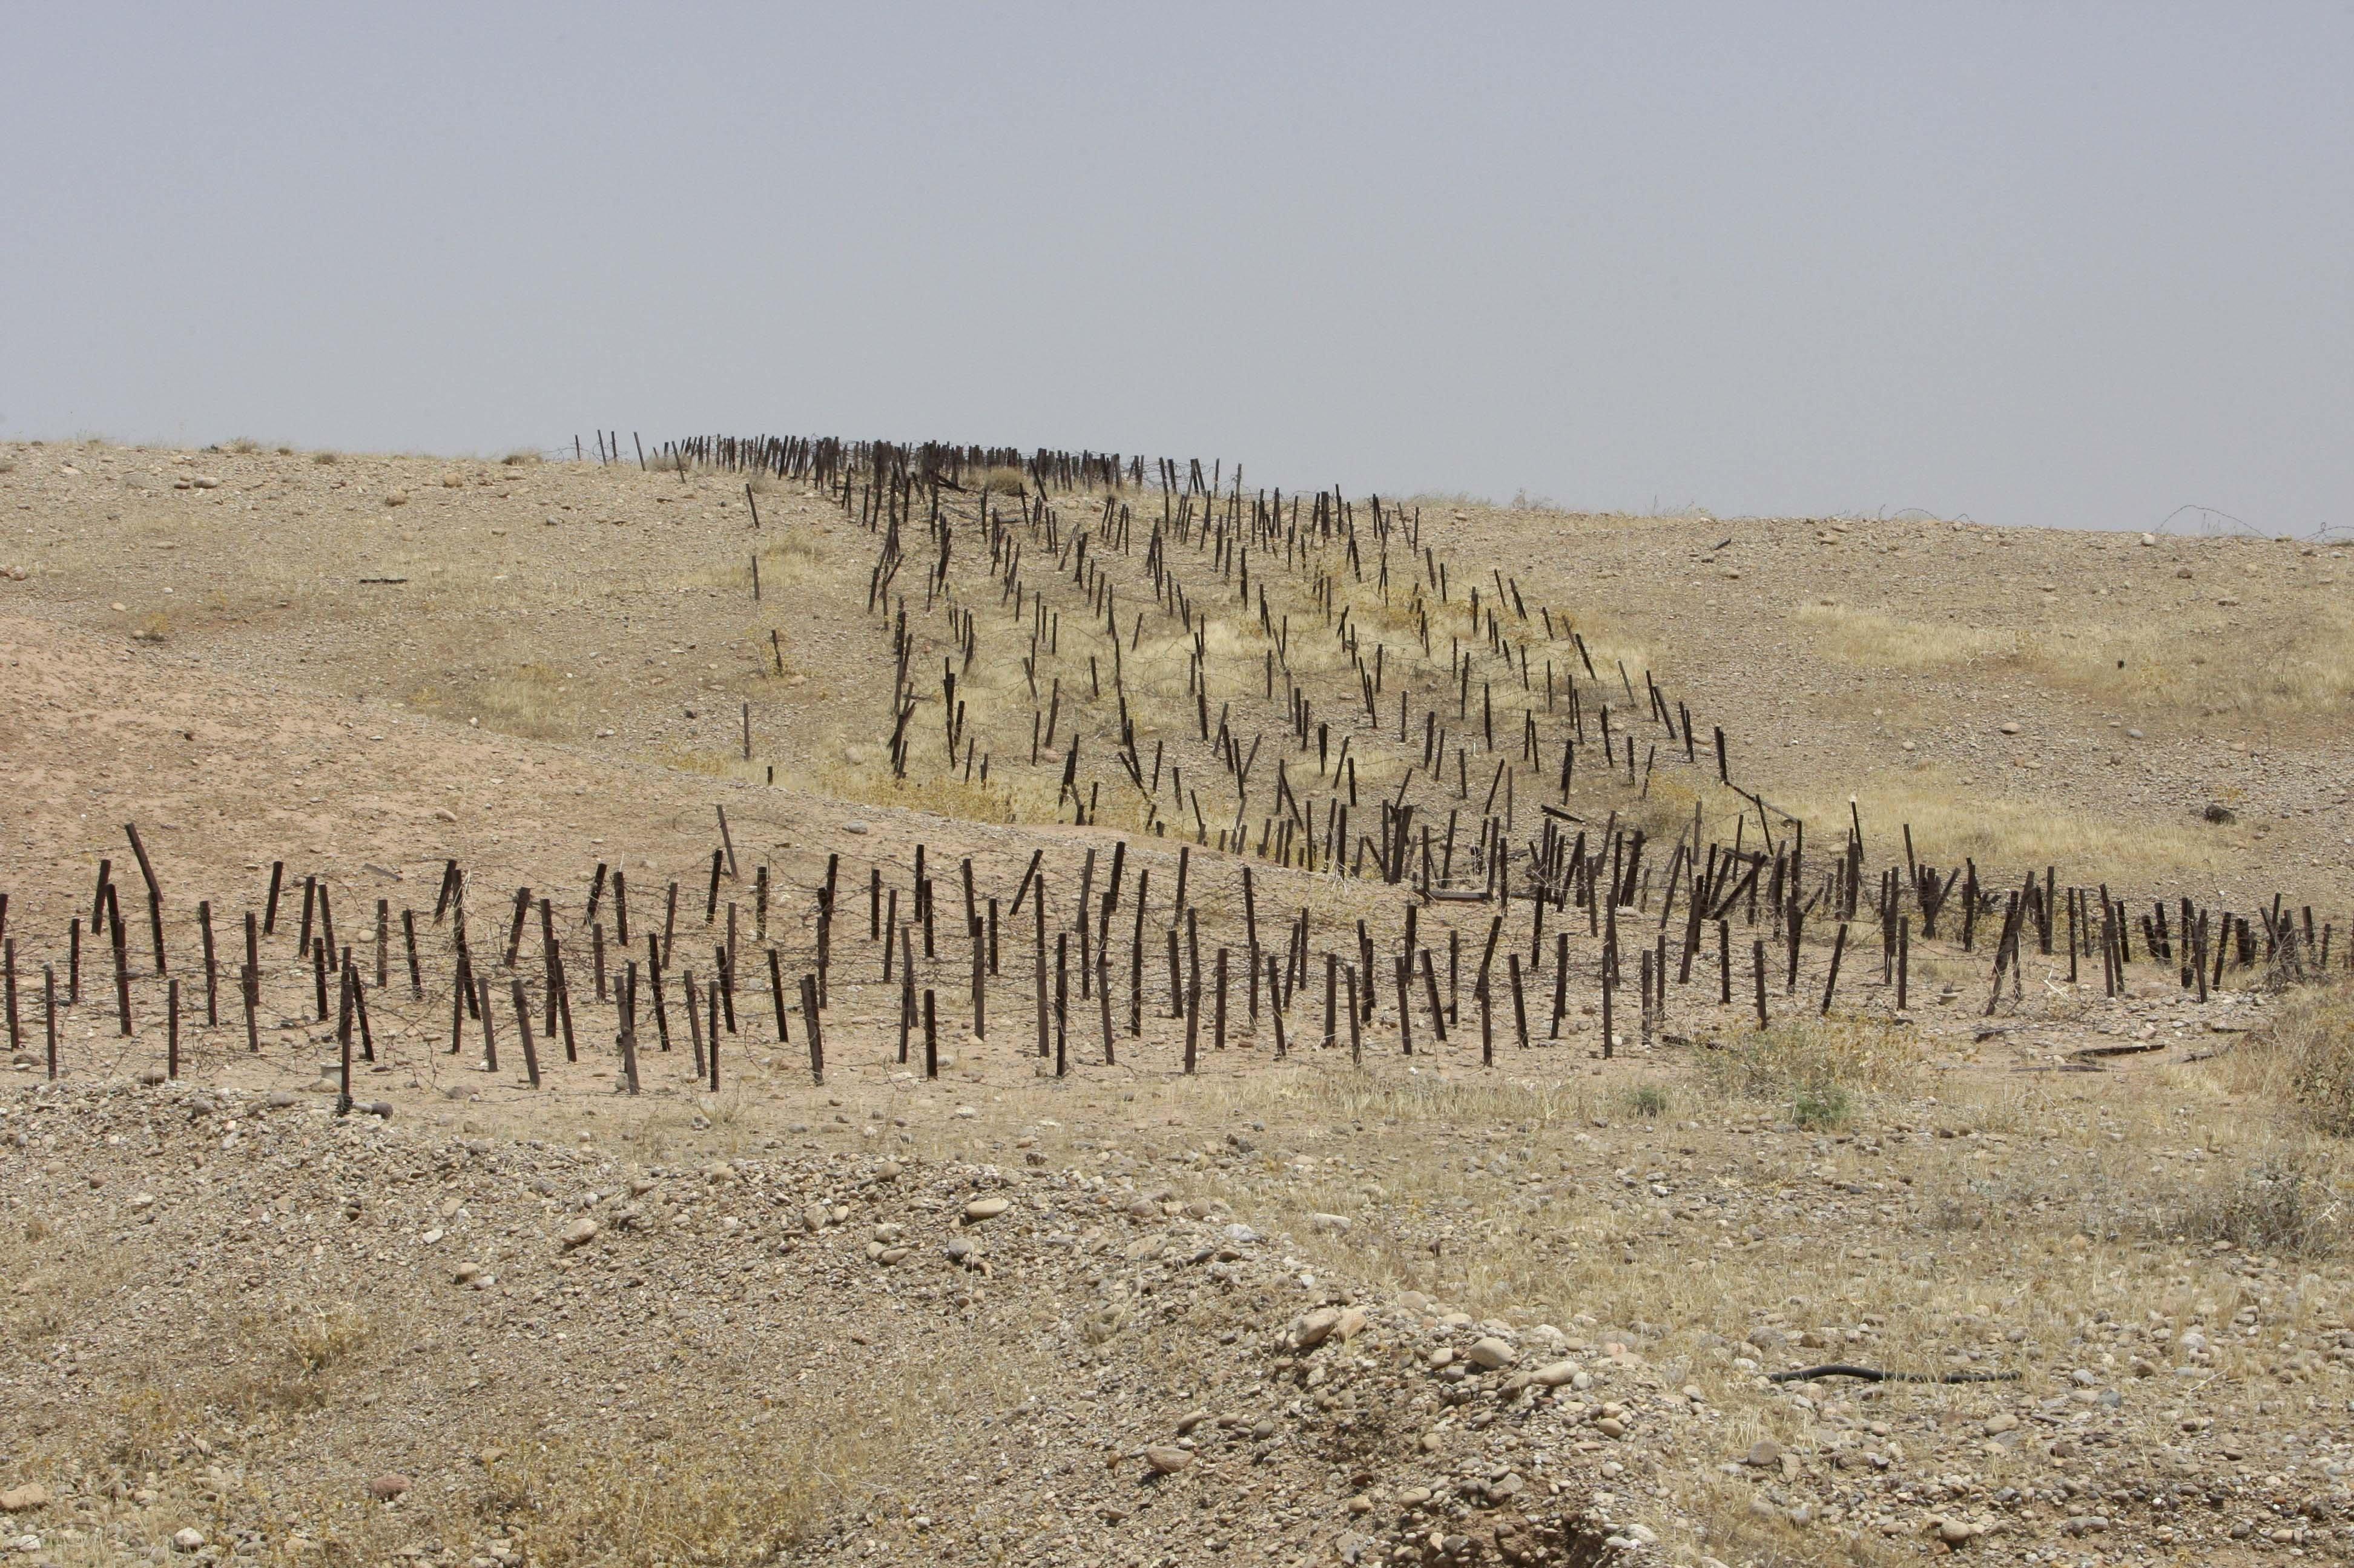 Les echos de la guerre Iran-Irak